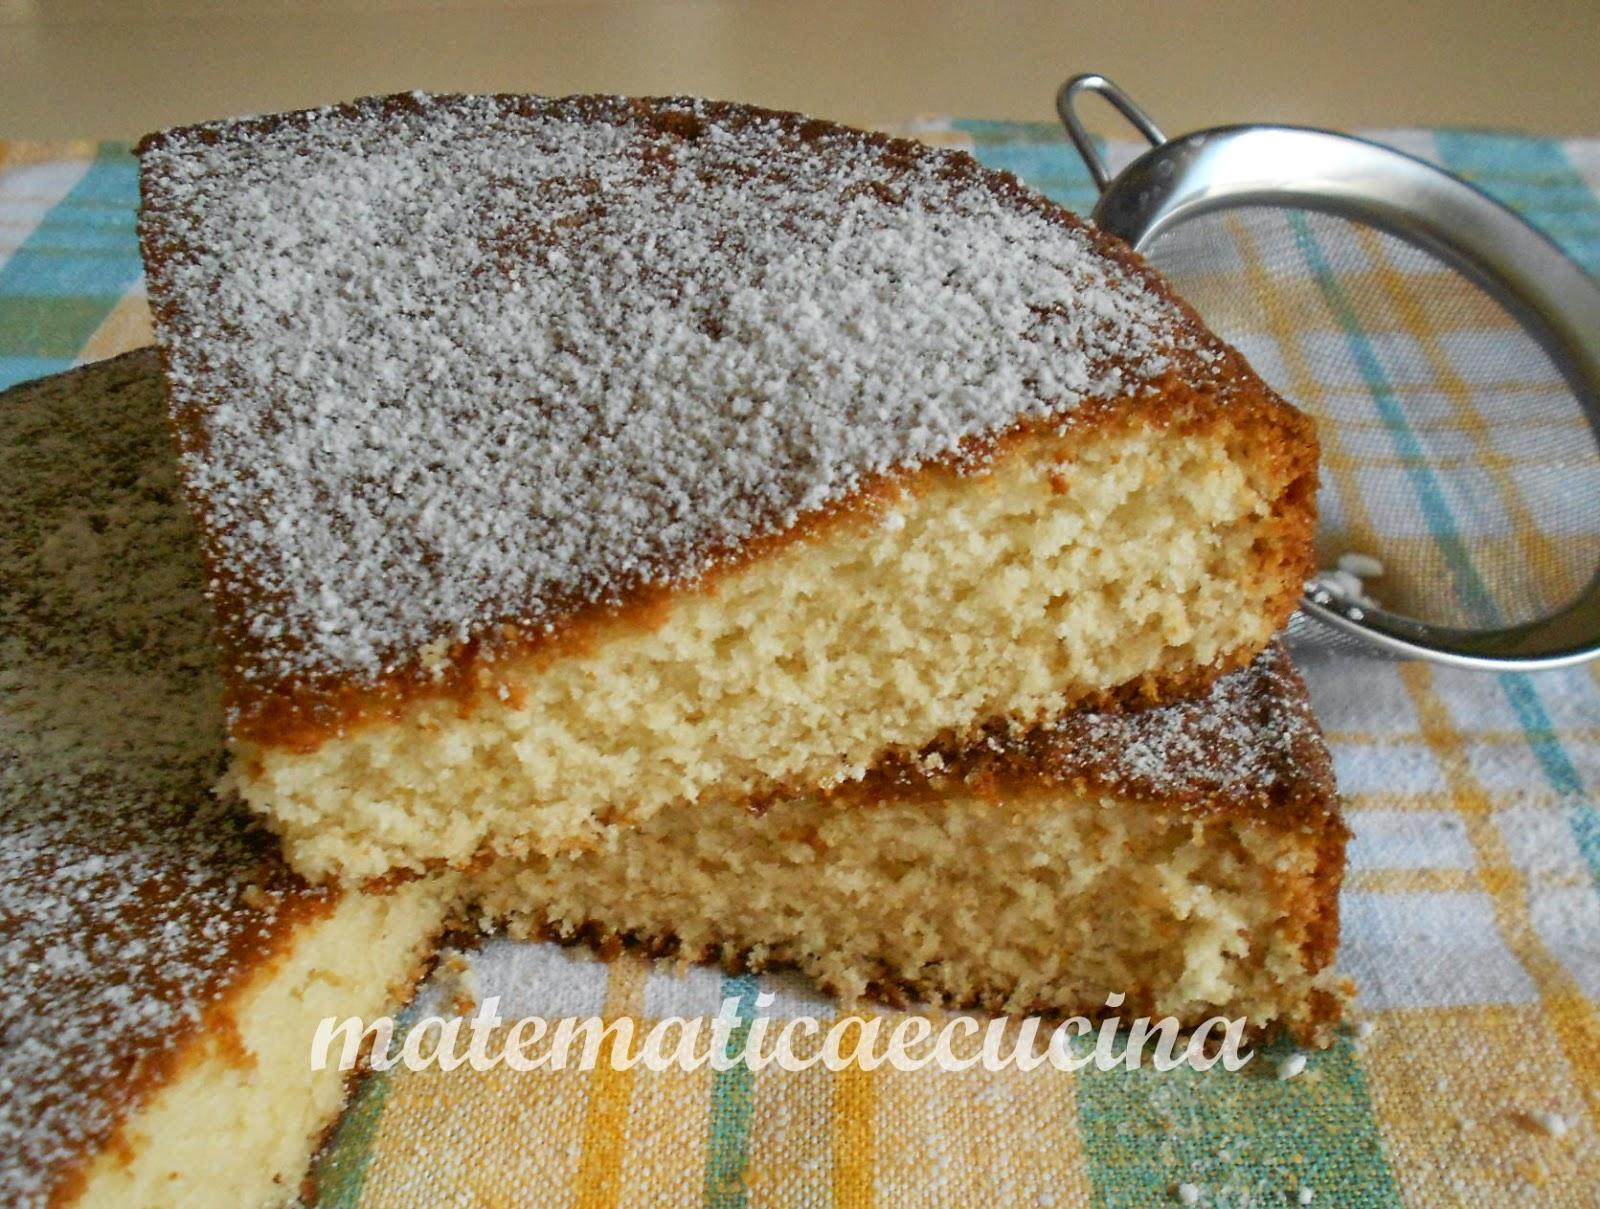 Ricetta Torta Con 1 Uovo.4 Bp Blogspot Com Xsiu4dk Pmi U Zaukk88si Aaaaaaa